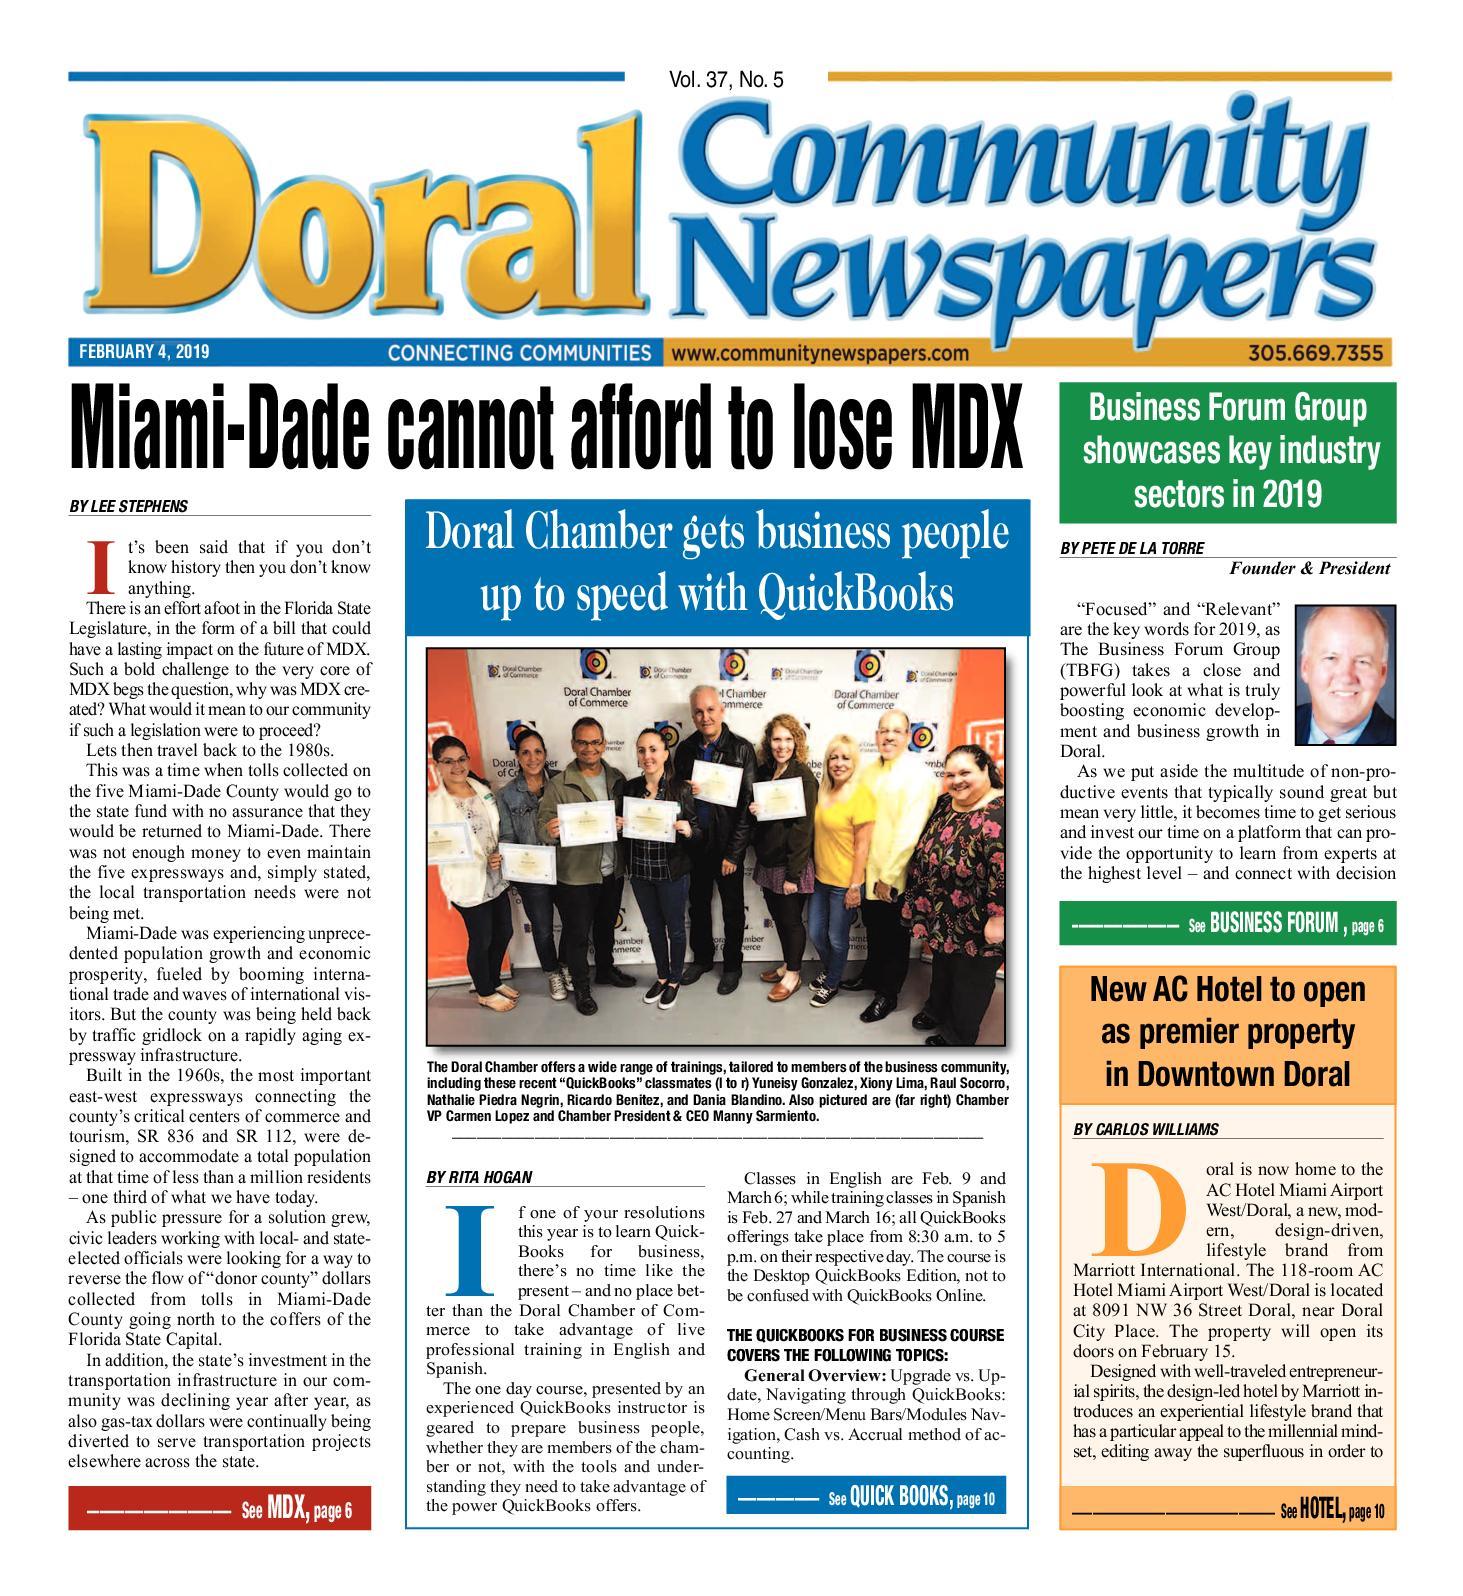 Calaméo - Doral Tribune 2.04.2019